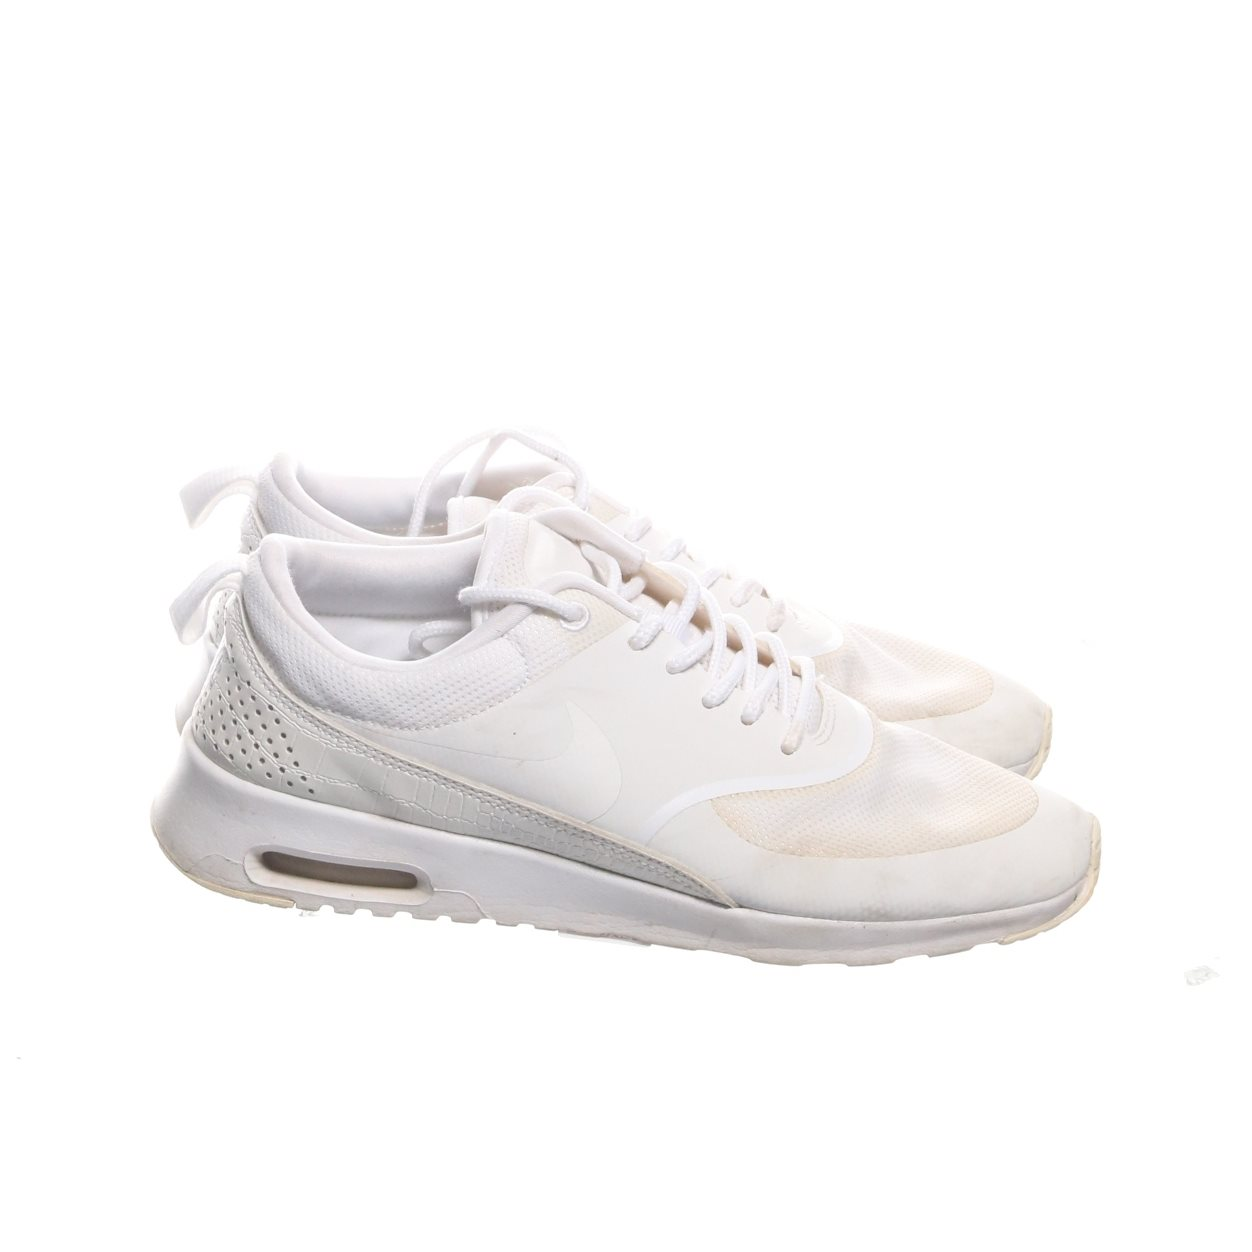 premium selection 19bee a538b Nike, Sneakers, Strl  38,5, Air Max Thea, Vit